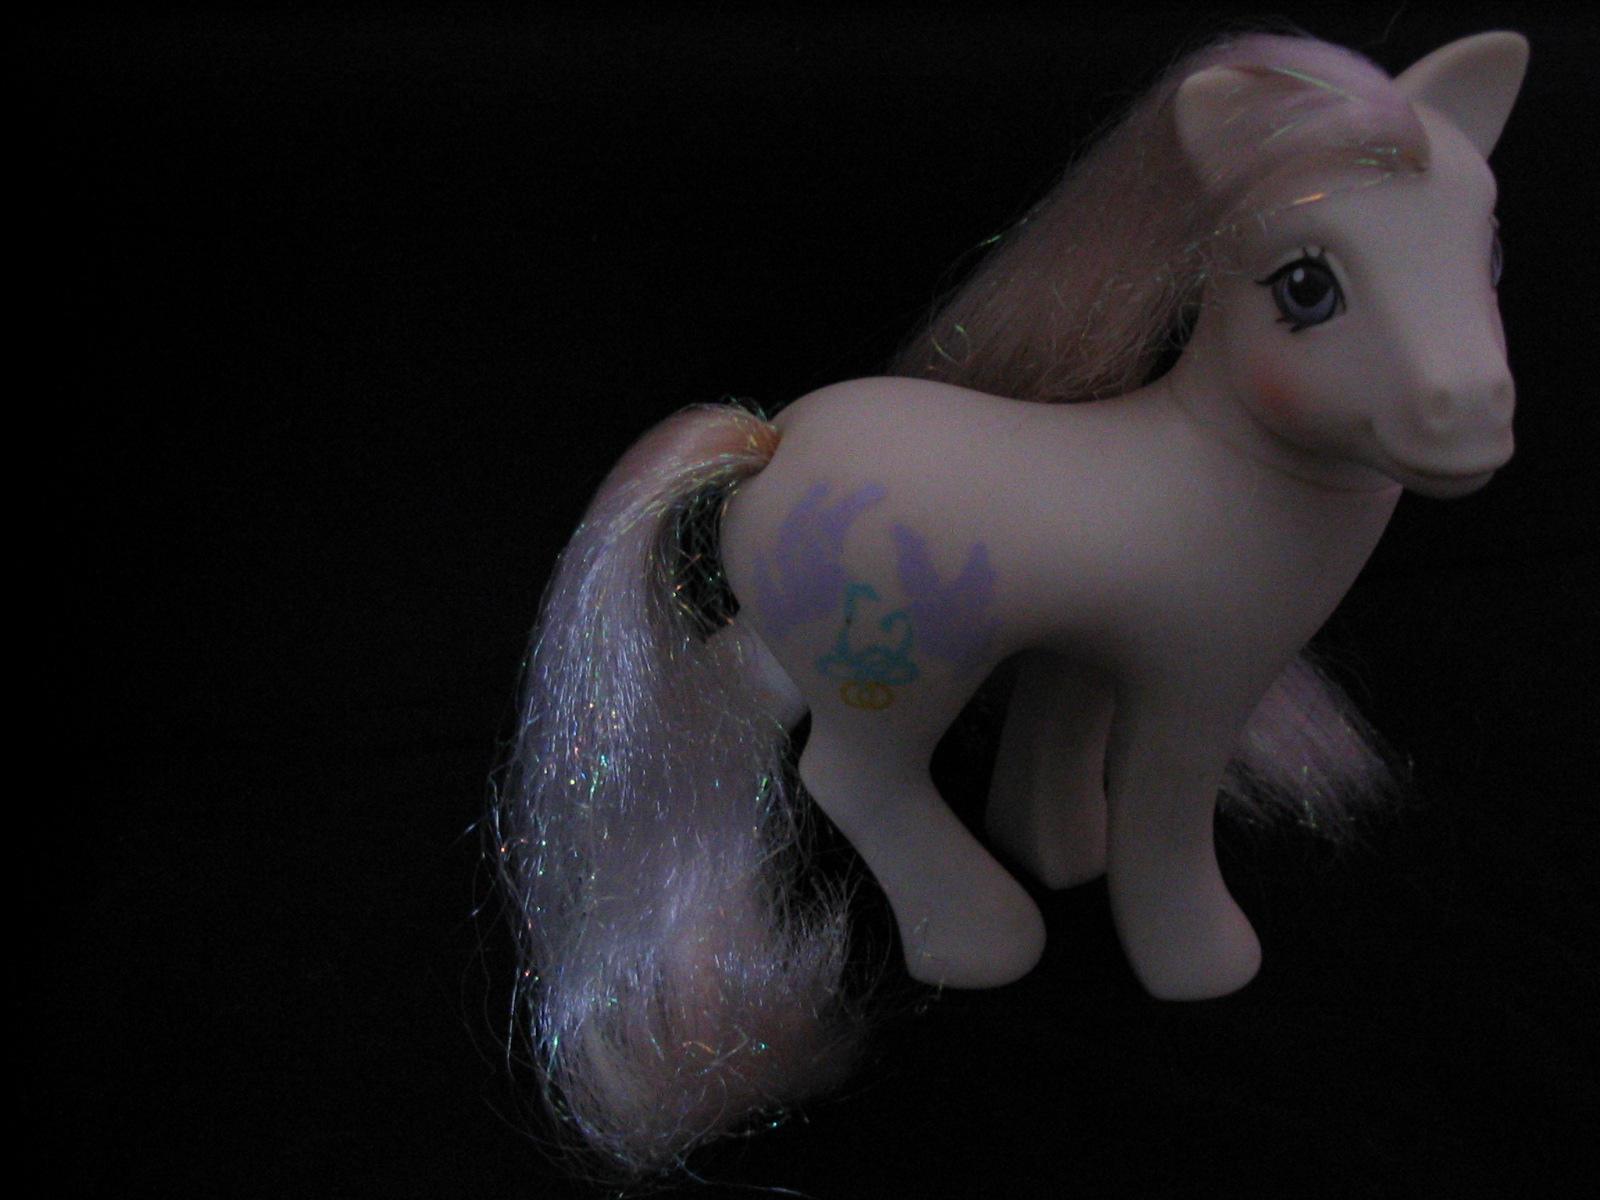 peony-stock: my little pony 2 by peony-stock